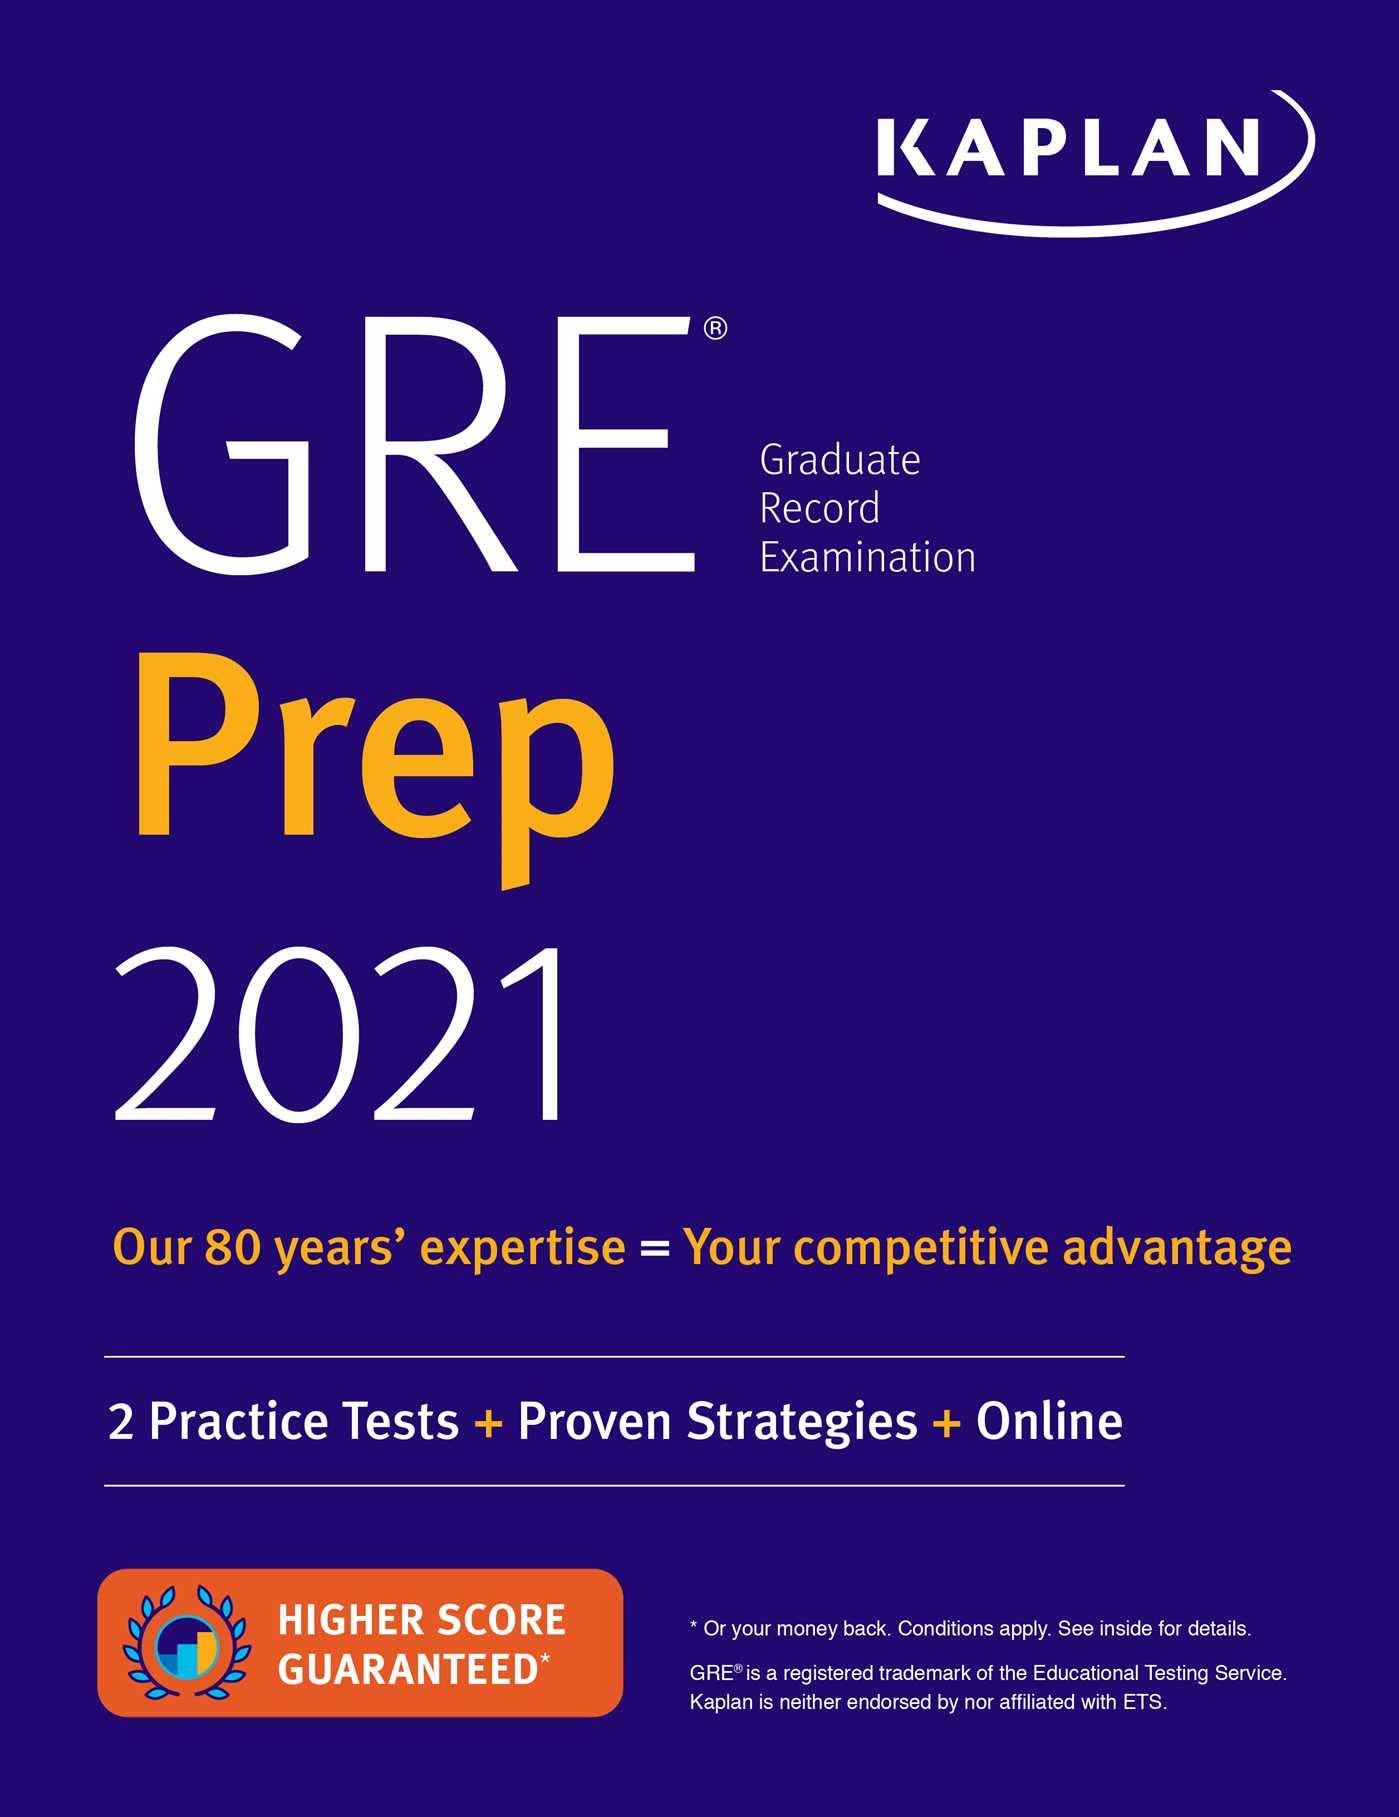 GRE Prep 2021: 2 Practice Tests + Proven Strategies + Online (Kaplan Test Prep)